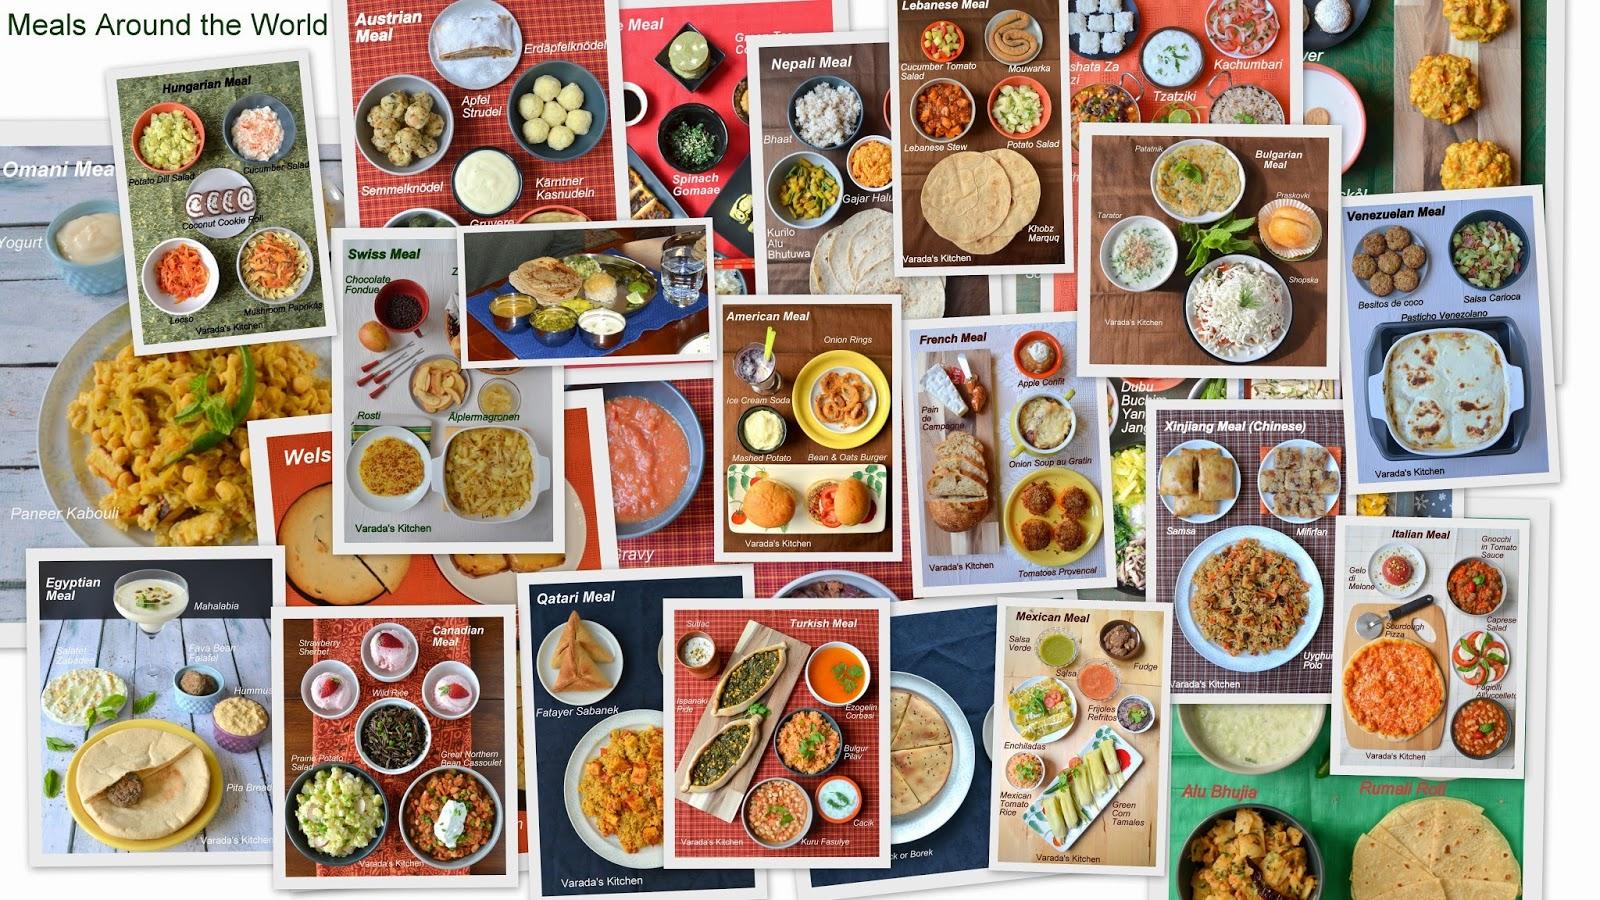 Varada S Kitchen Meals Around The World